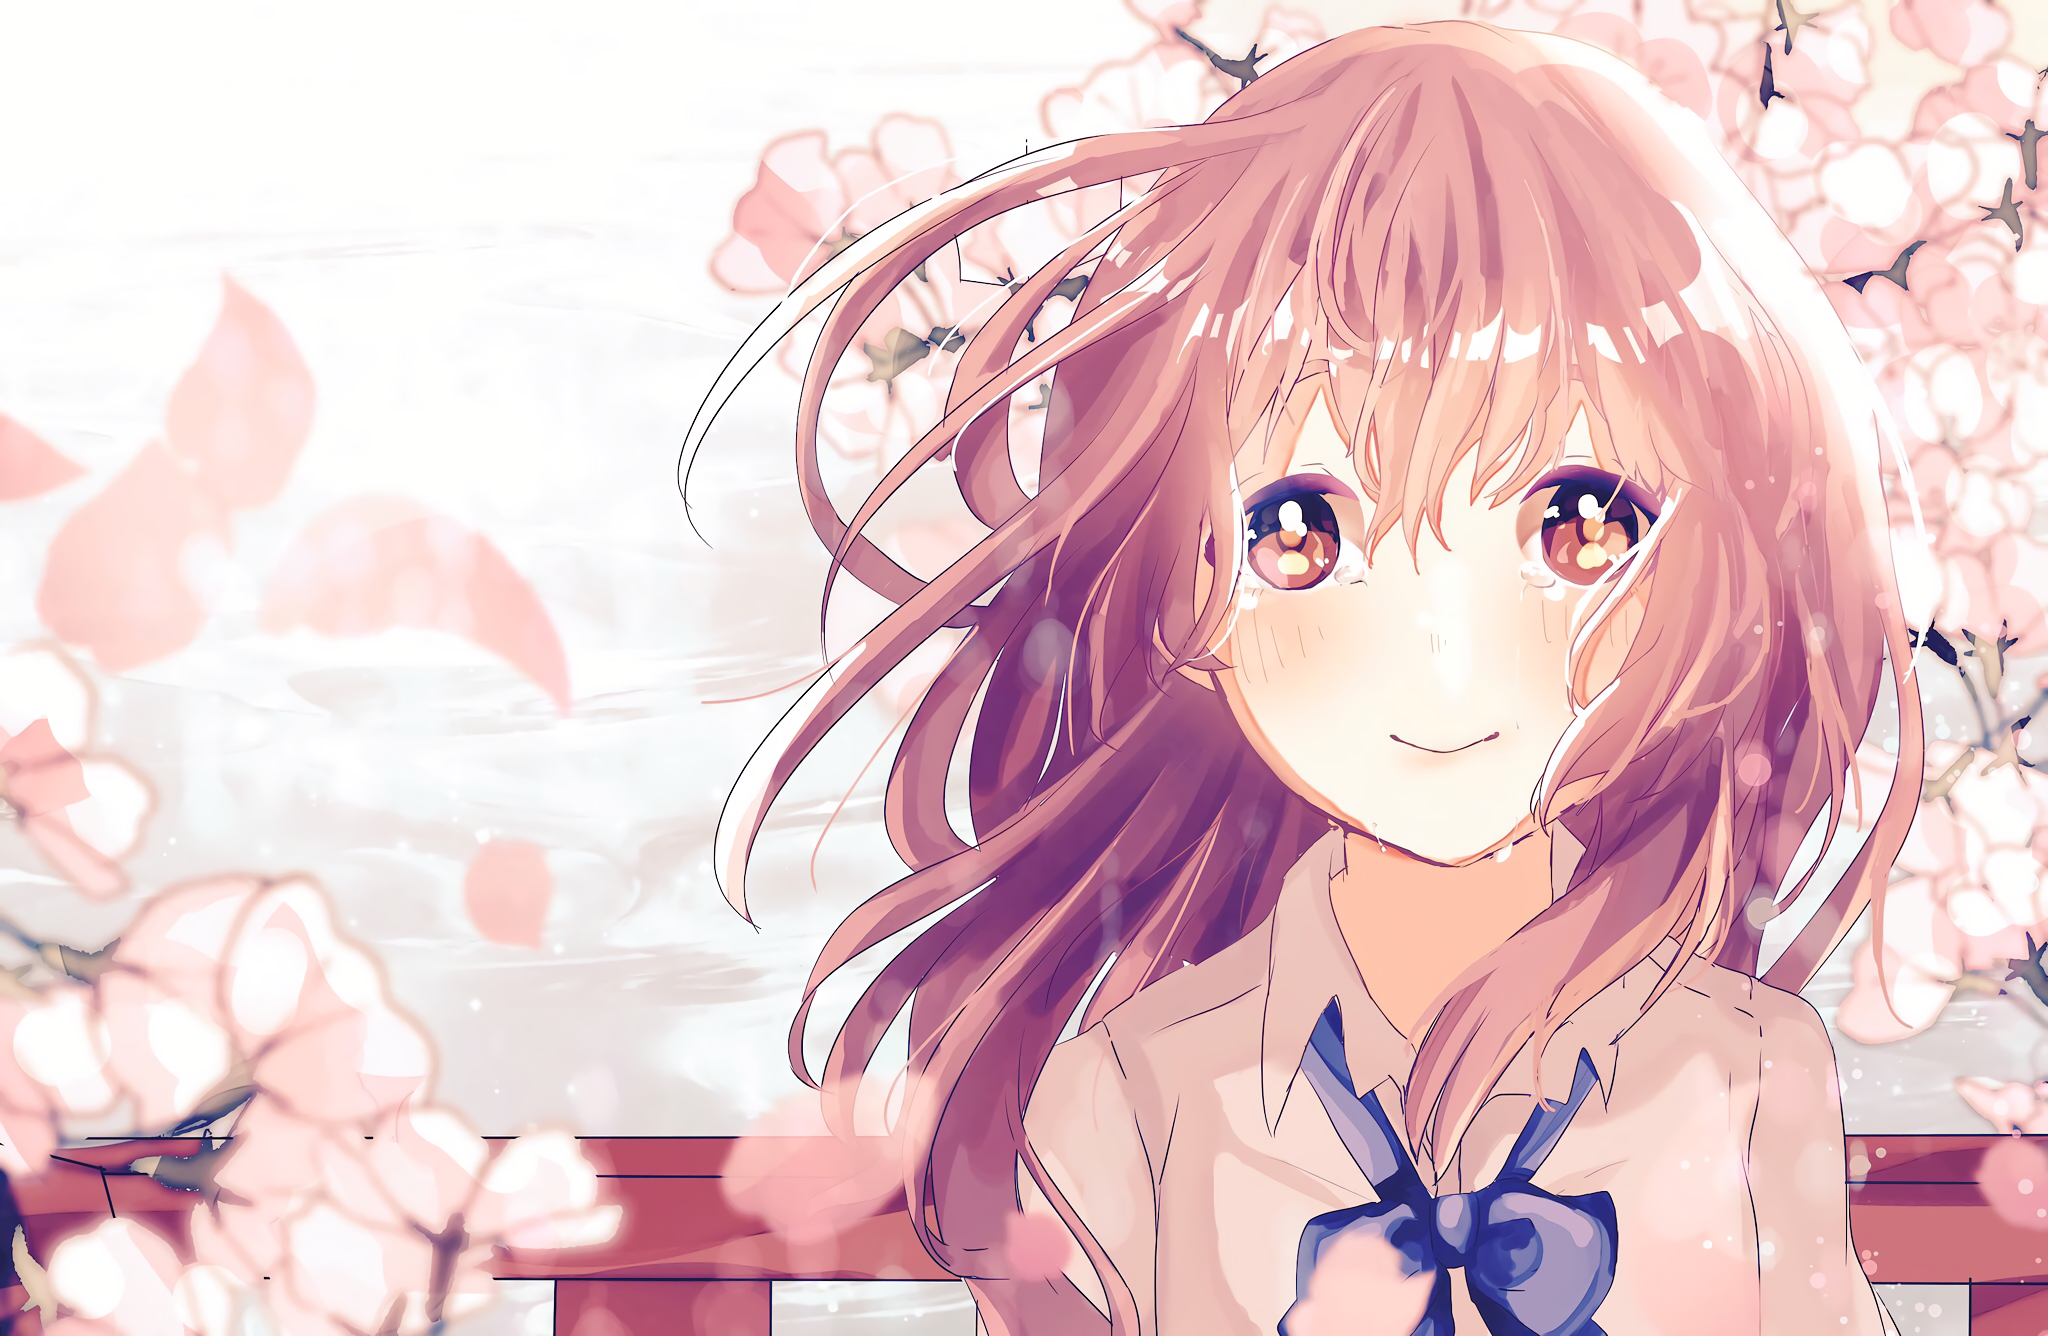 Koe No Katachi Silent Voice Anime Romance (3b) Koe